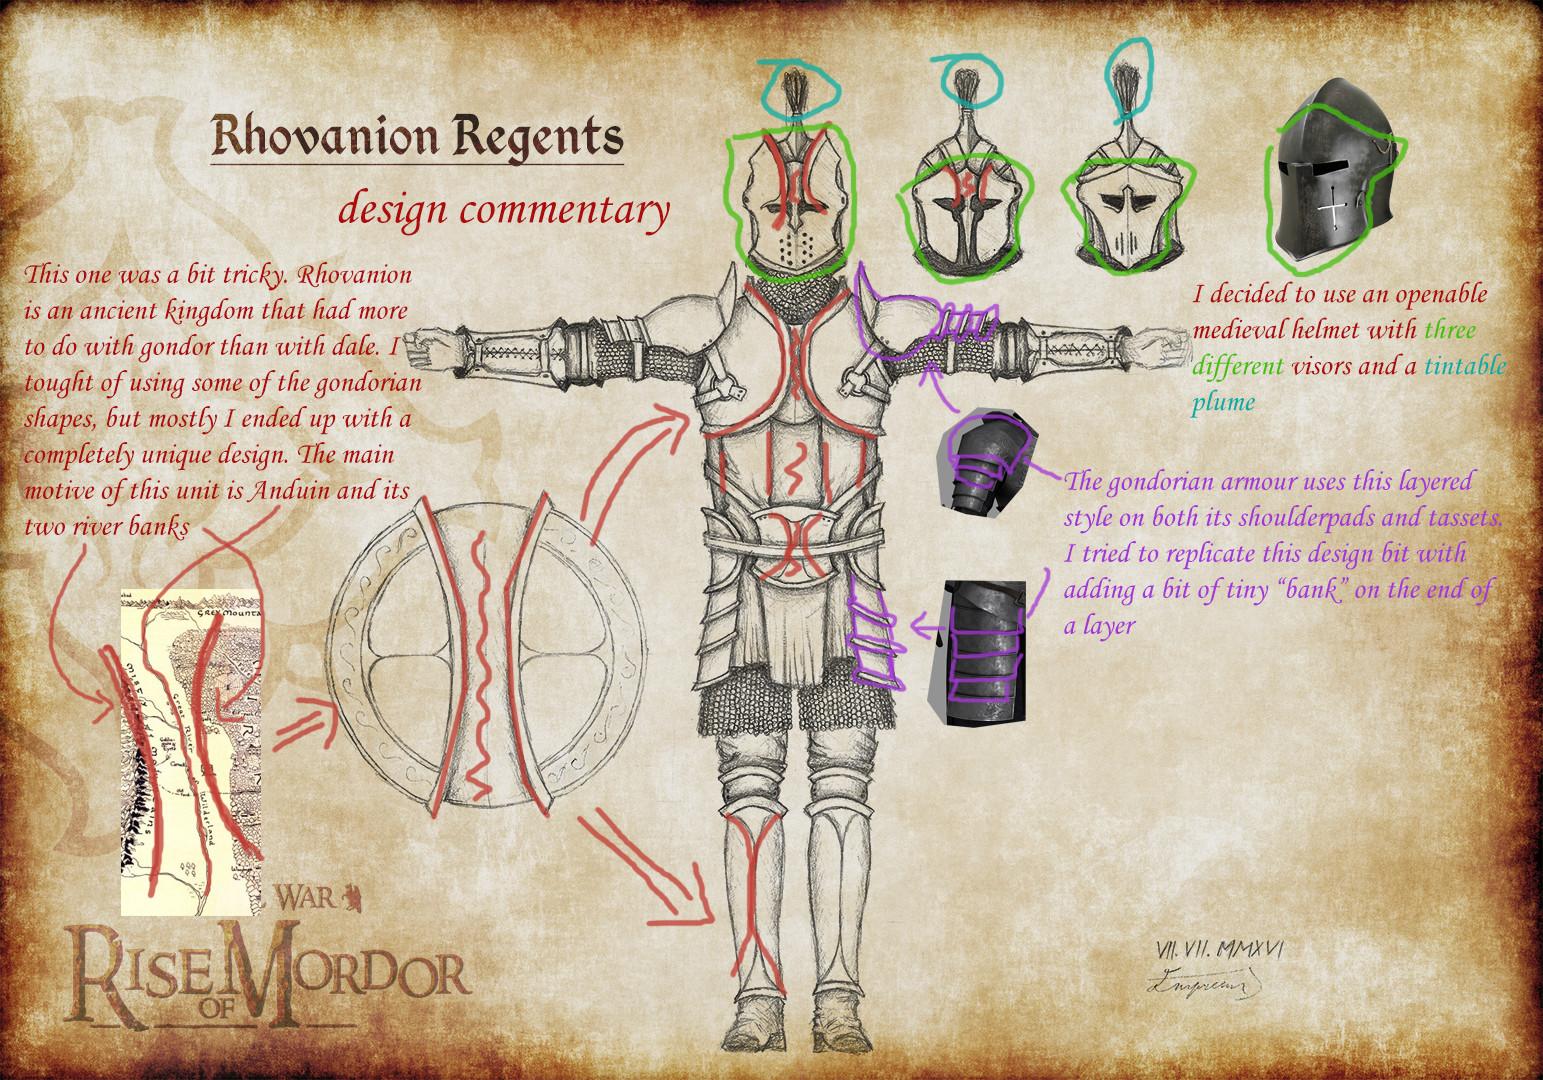 Adam dotlacil com concept rhovanion regents